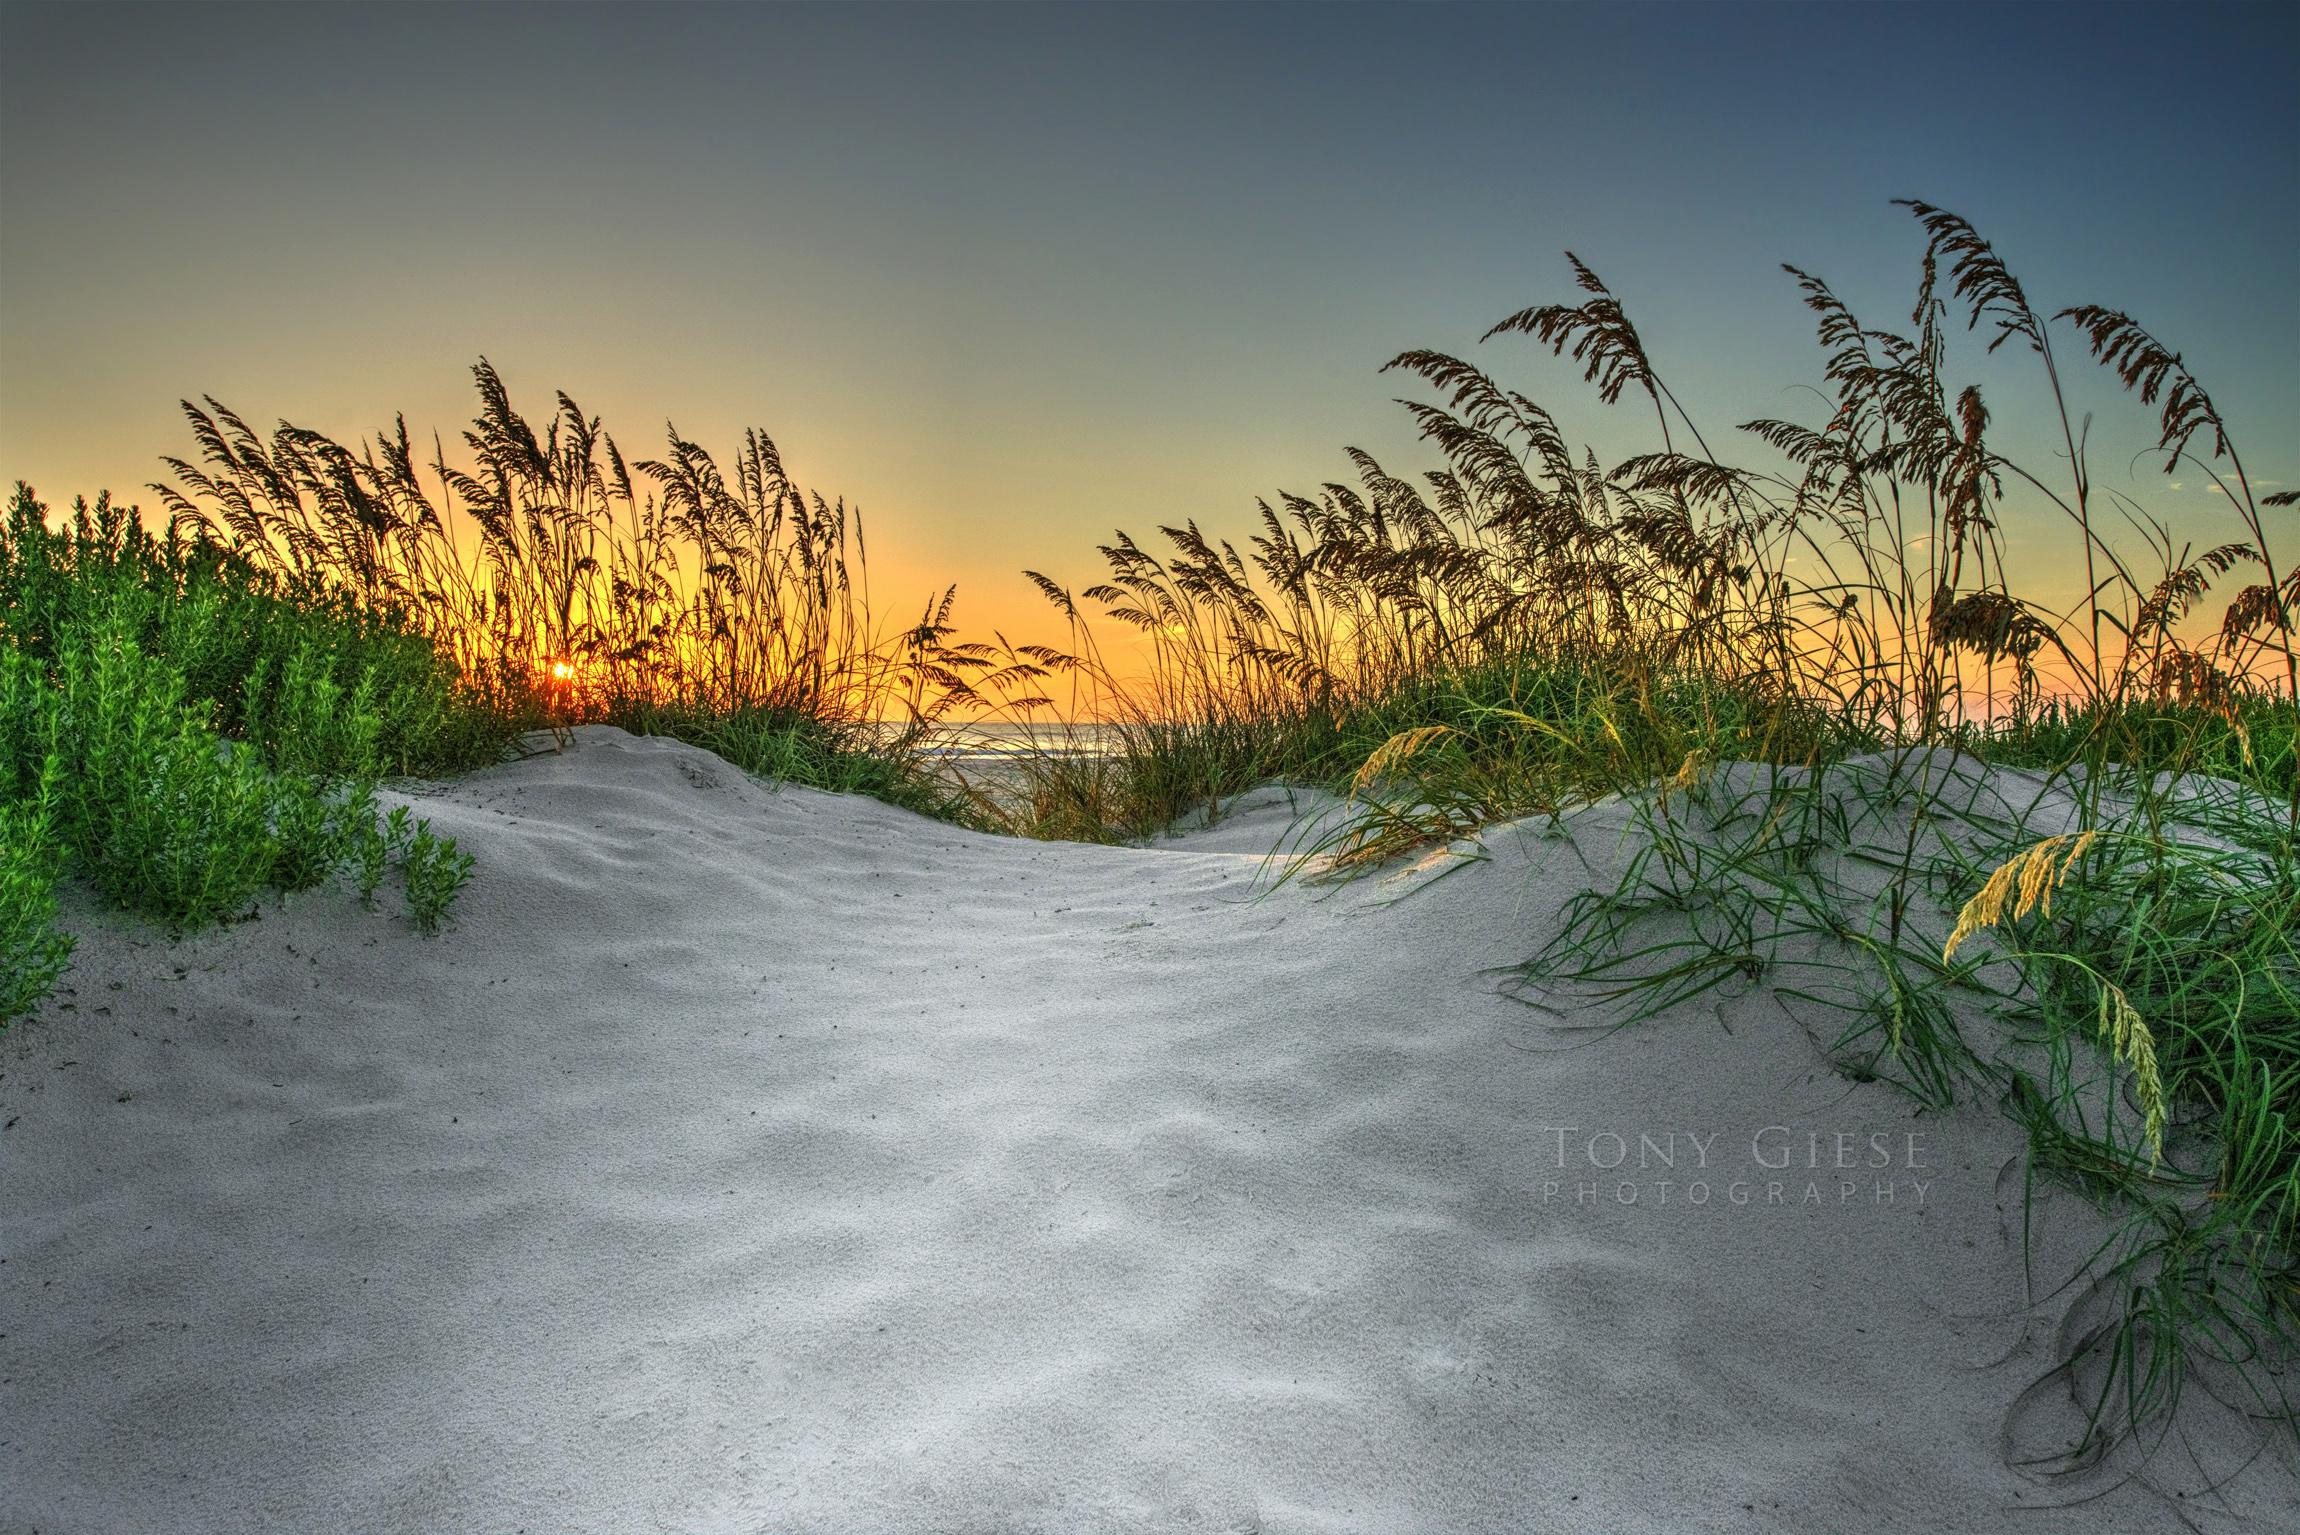 Daytona Beach Photography Tony Giese Professional Photographer